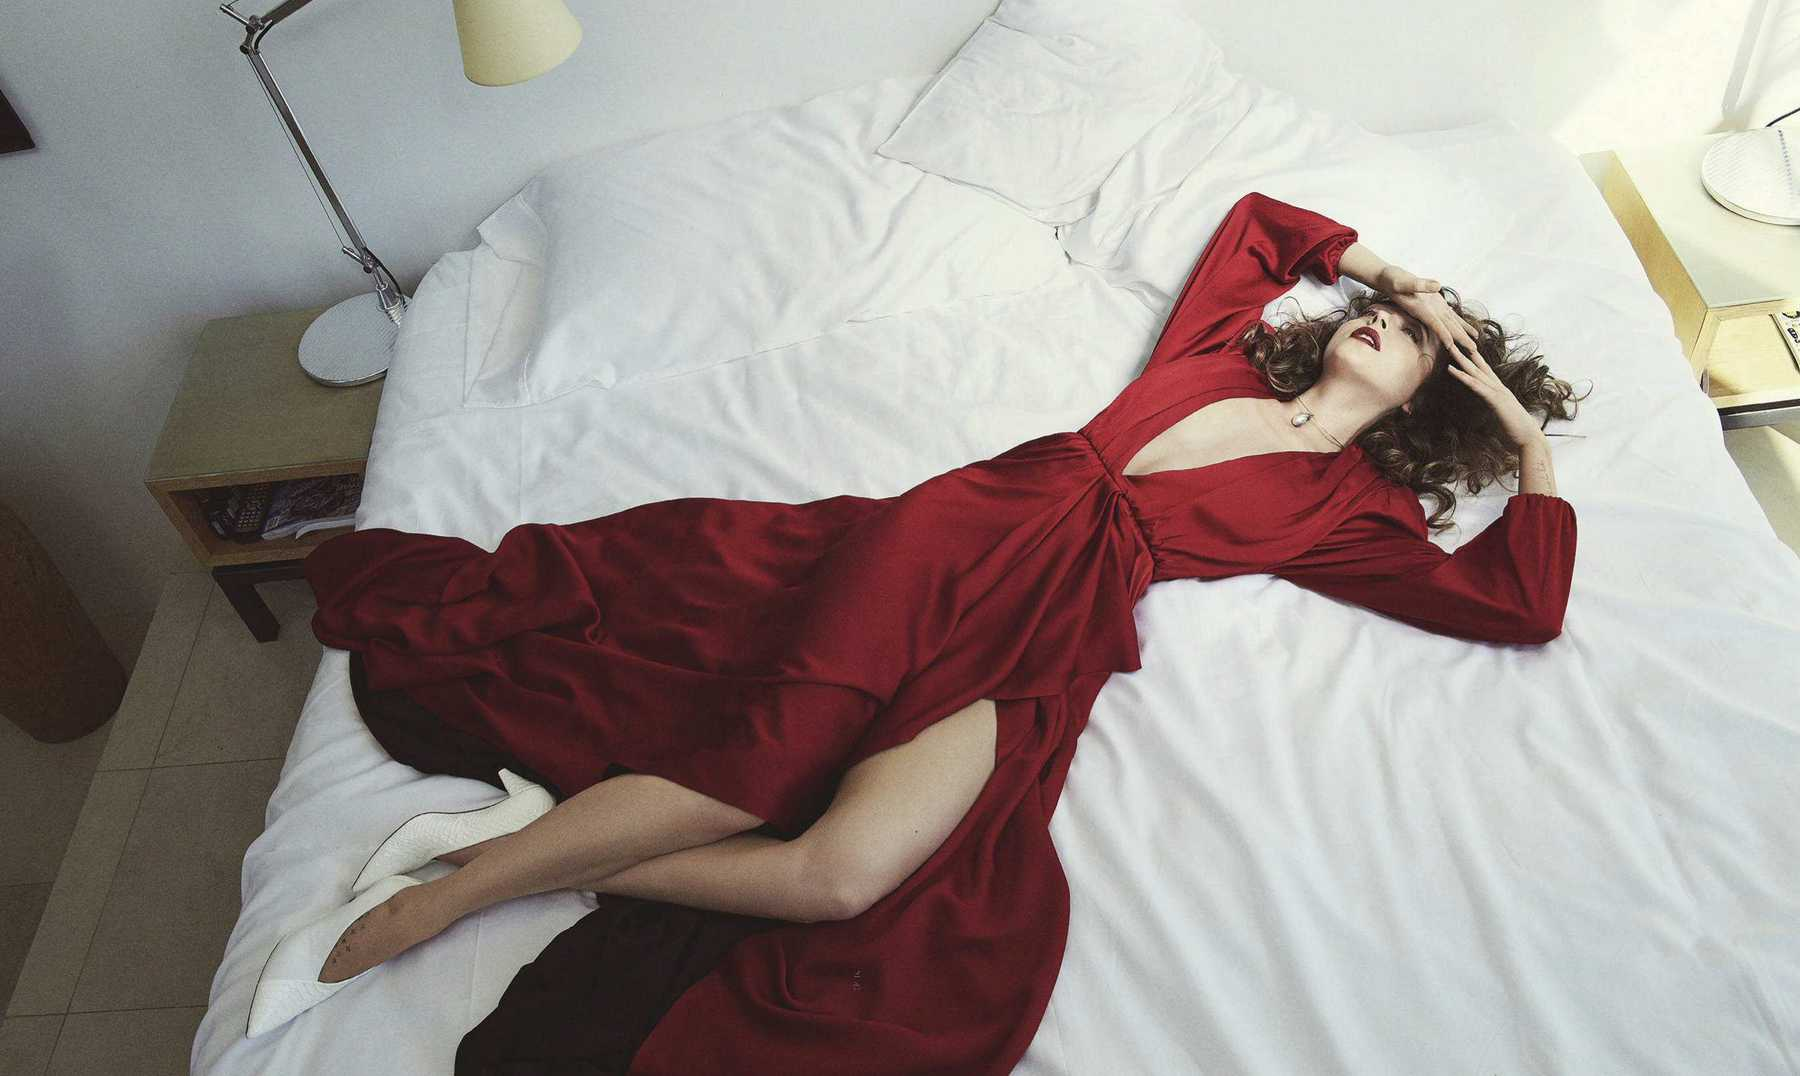 Dakota-Johnson-Emma-Summerton-Photoshoot-for-Vogue-Australia-October-2018341cd4983482654.jpg